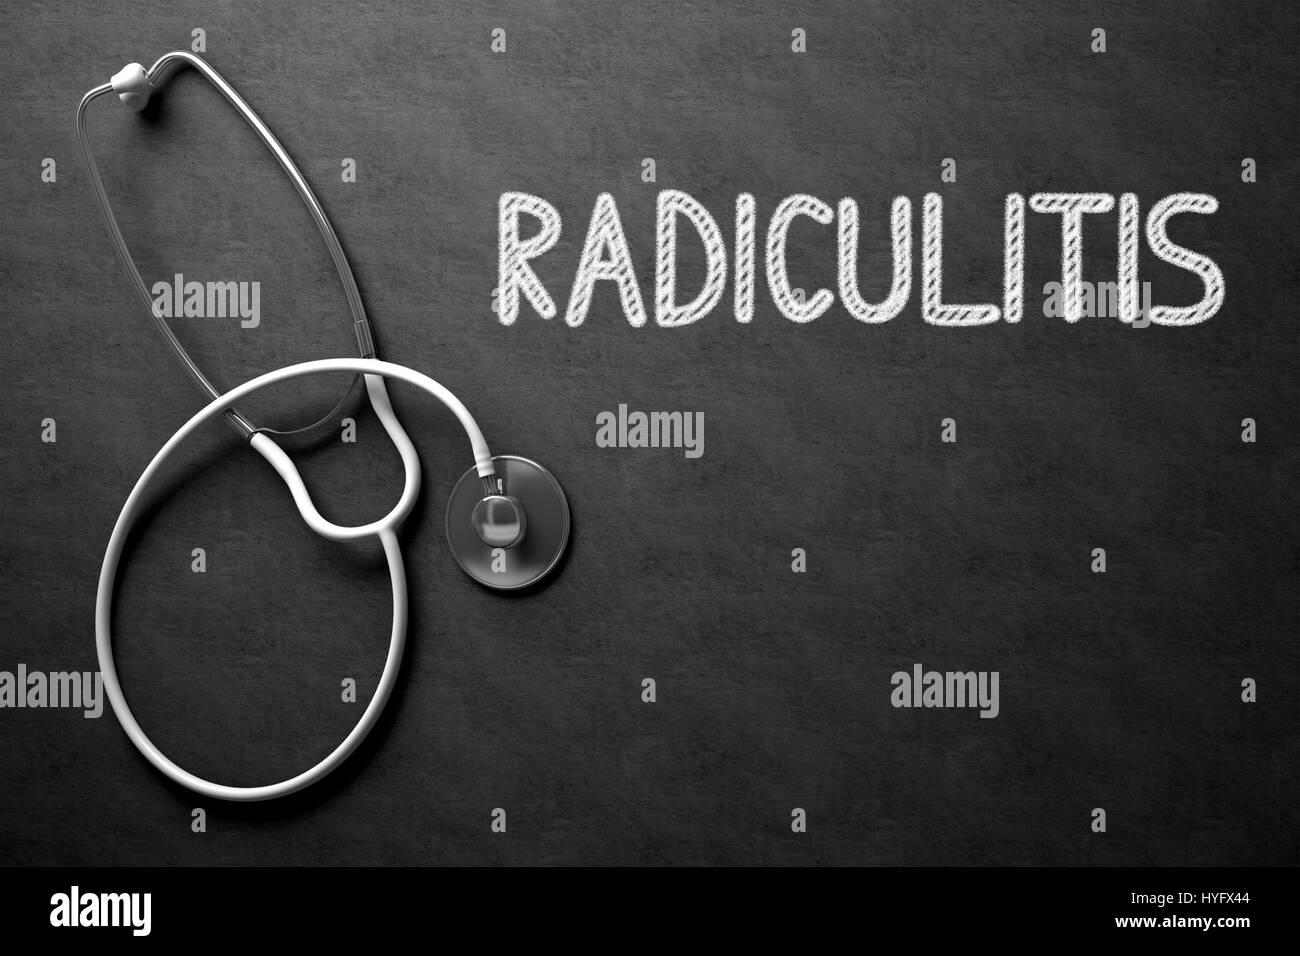 Radiculitis - Text on Chalkboard. 3D Illustration. - Stock Image